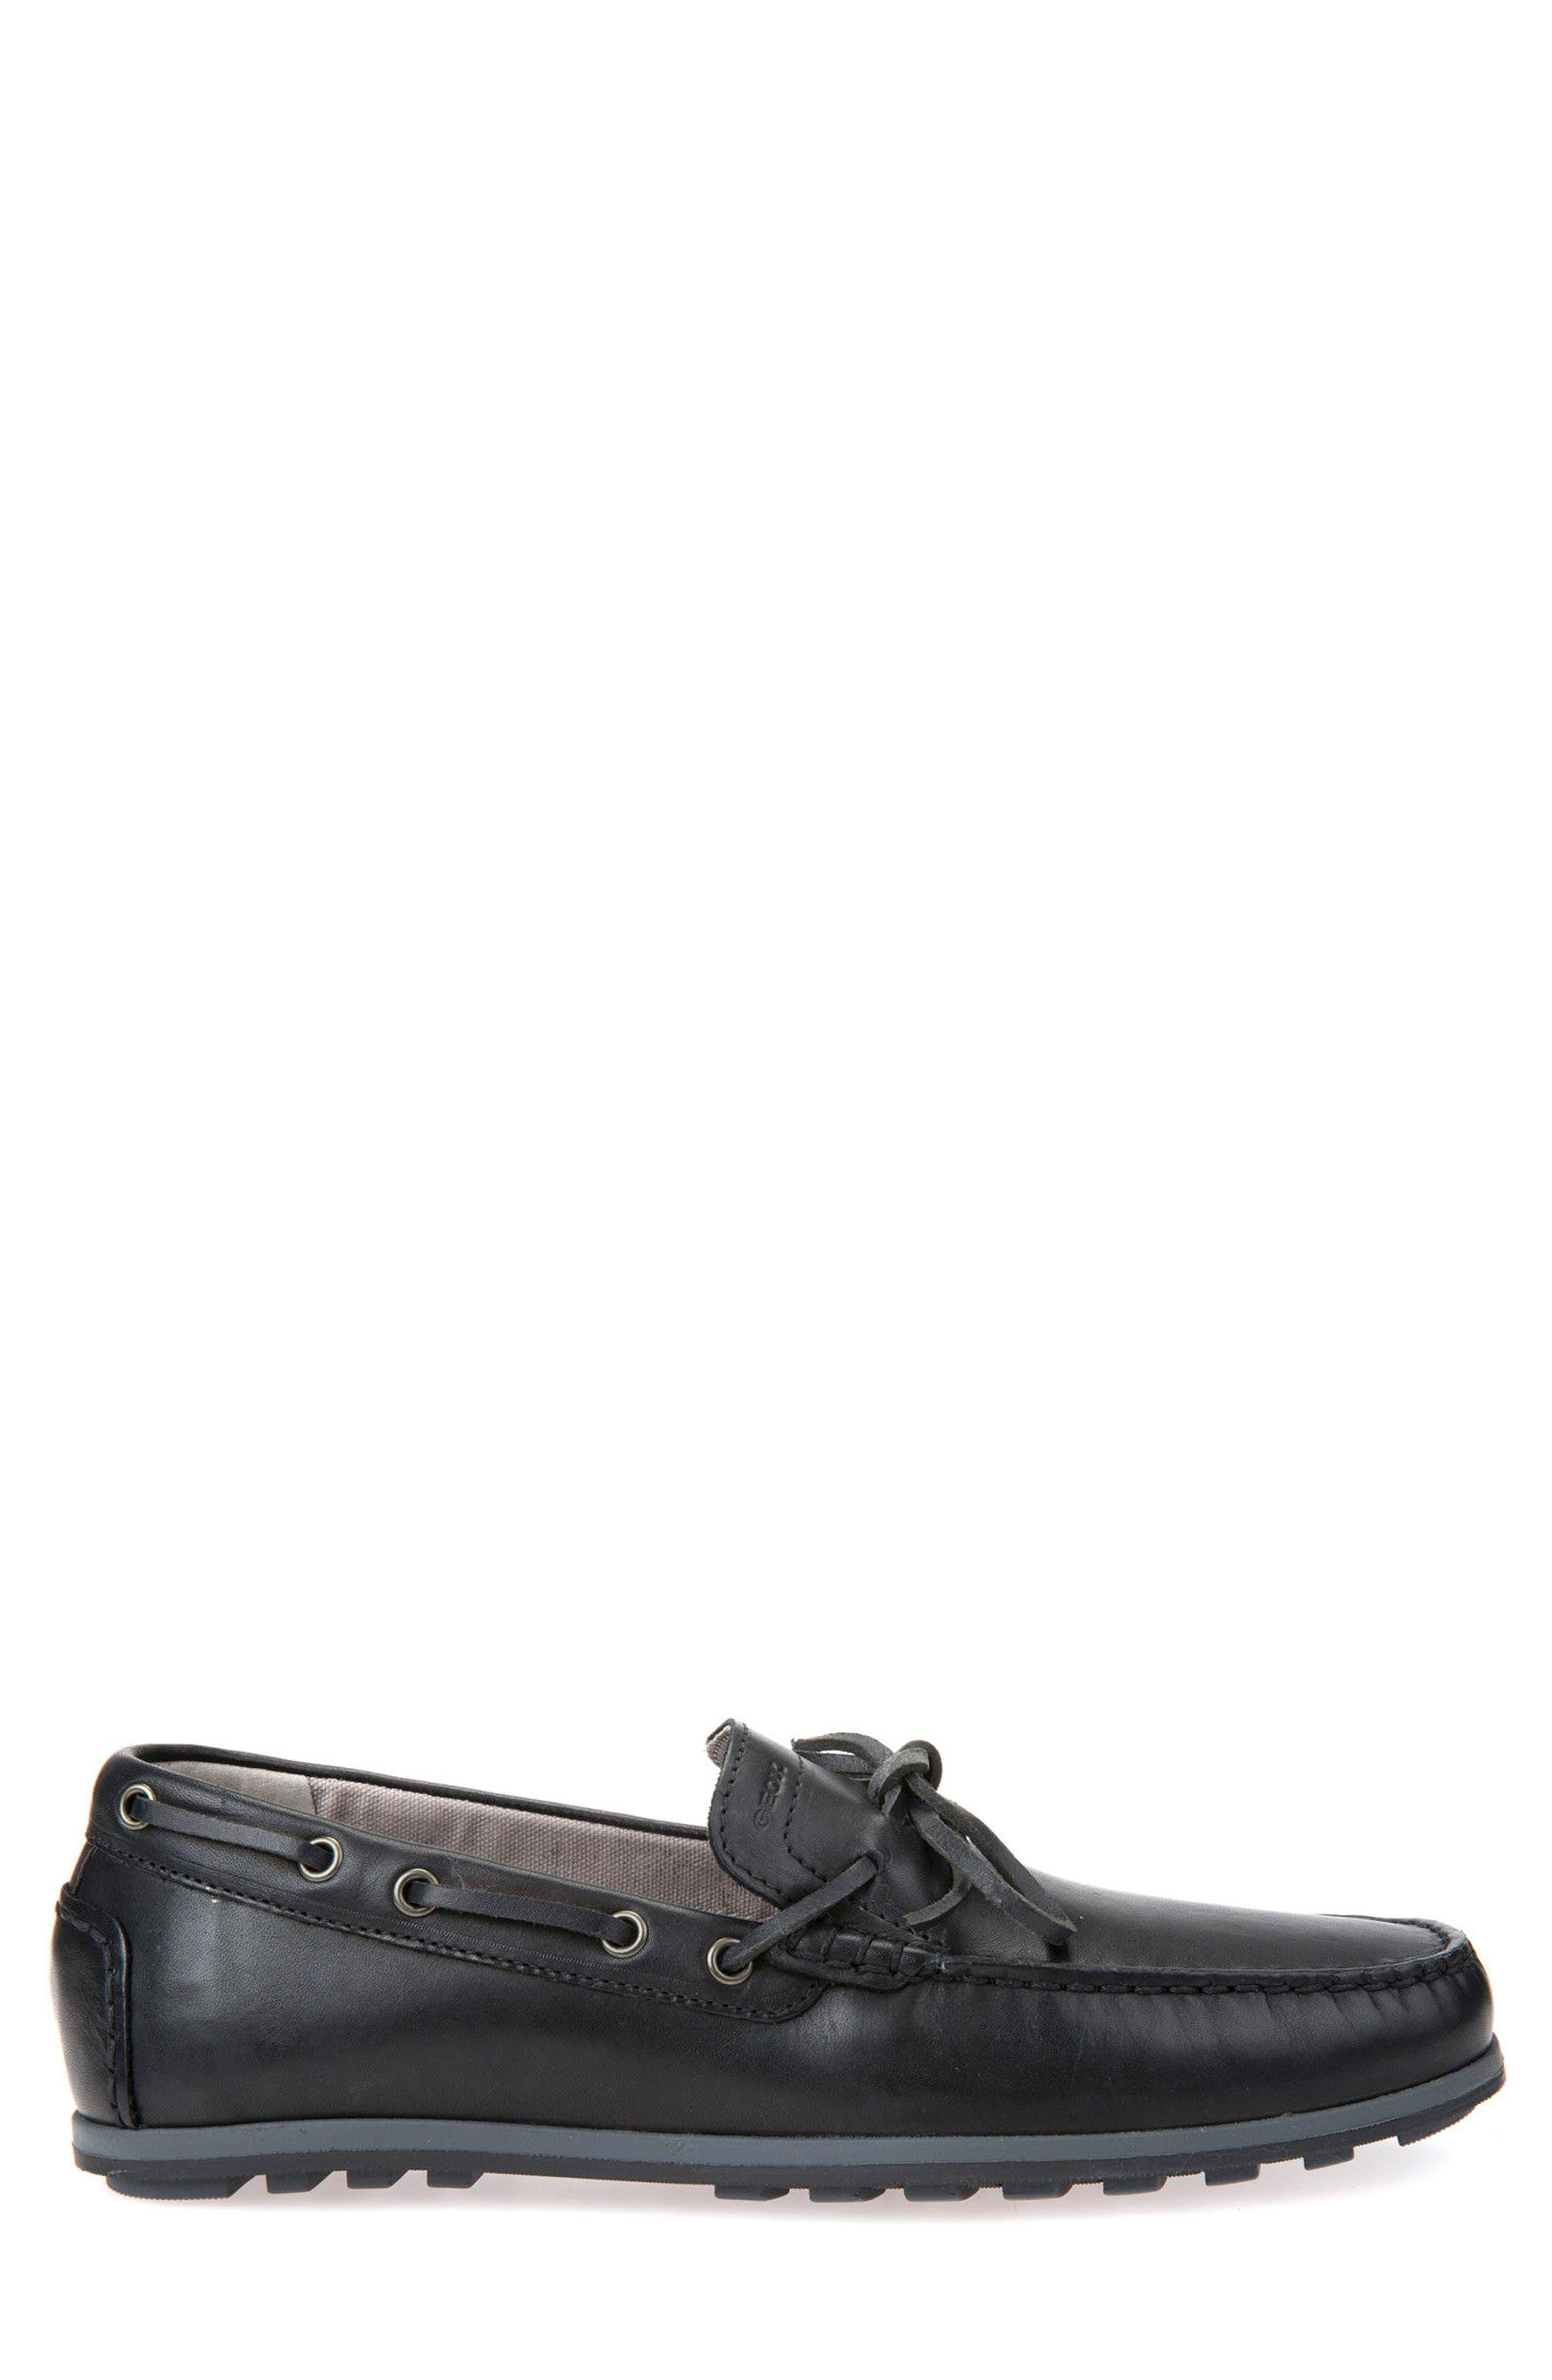 Alternate Image 3  - Geox Mirvin 3 Boat Shoe (Men)